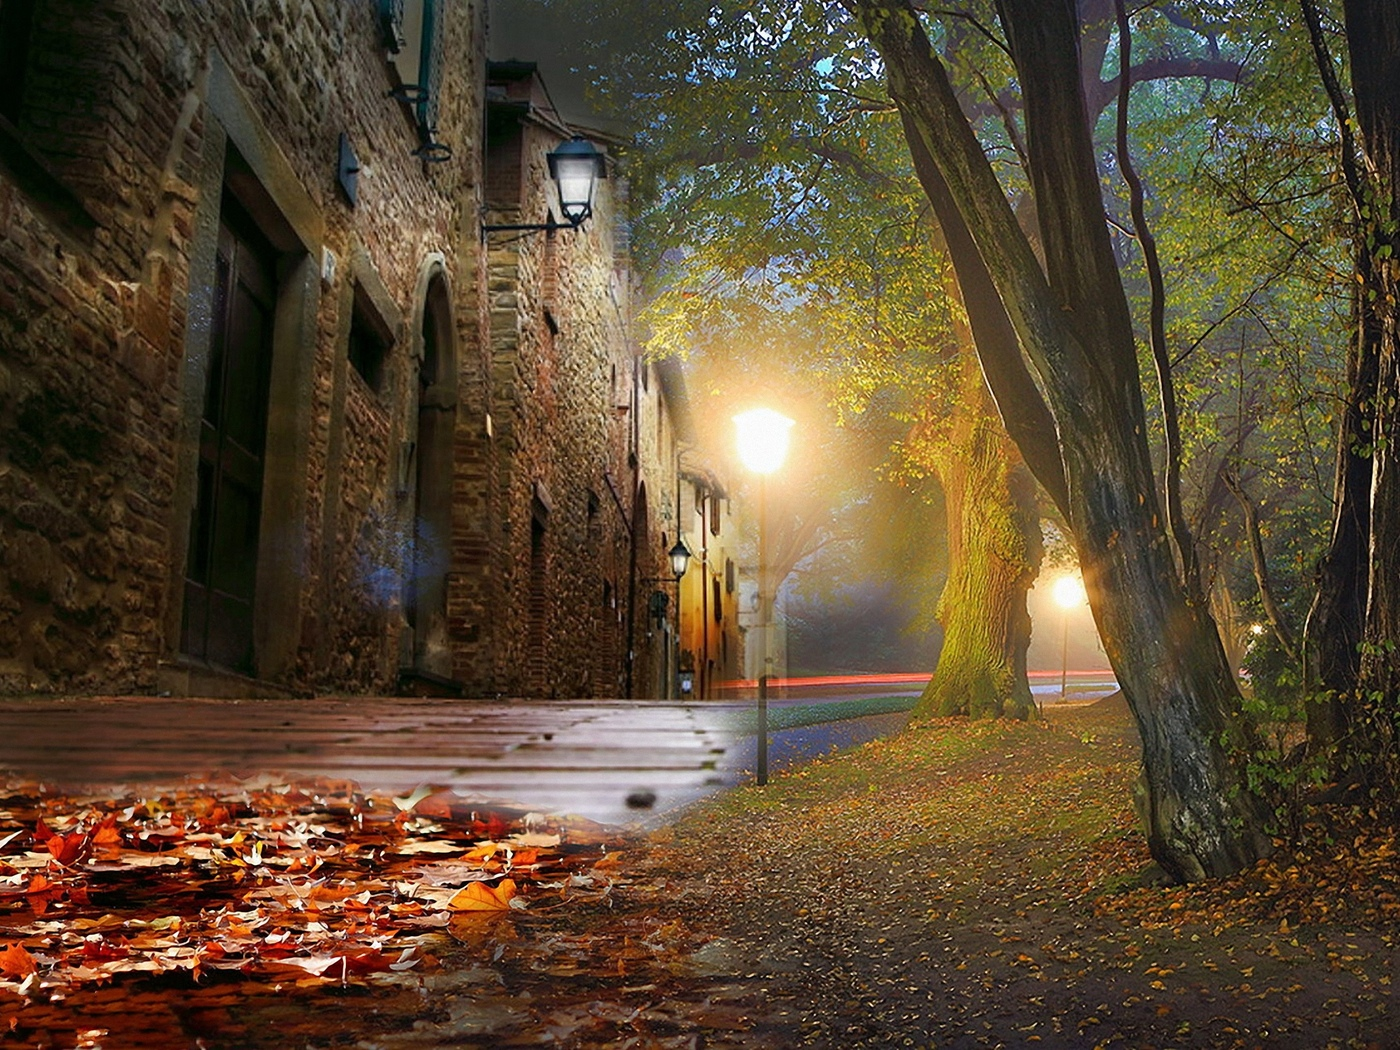 улица, туман, осень, дом, фонари